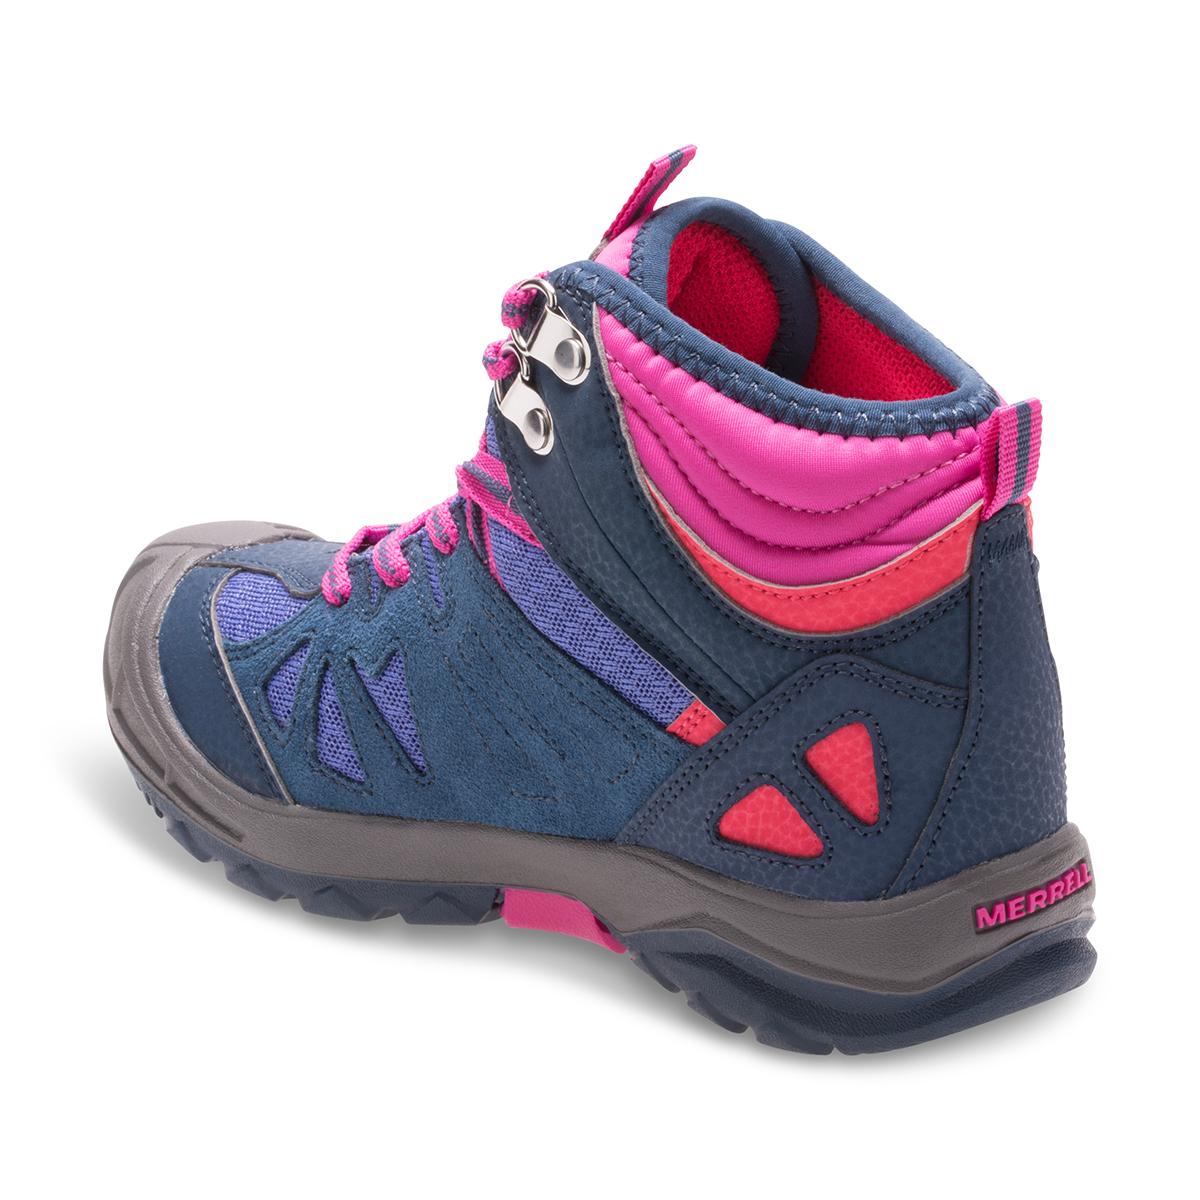 31e2c9e9b27f1 Merrell Capra Mid Waterproof Shoes - Children to Youths | MEC